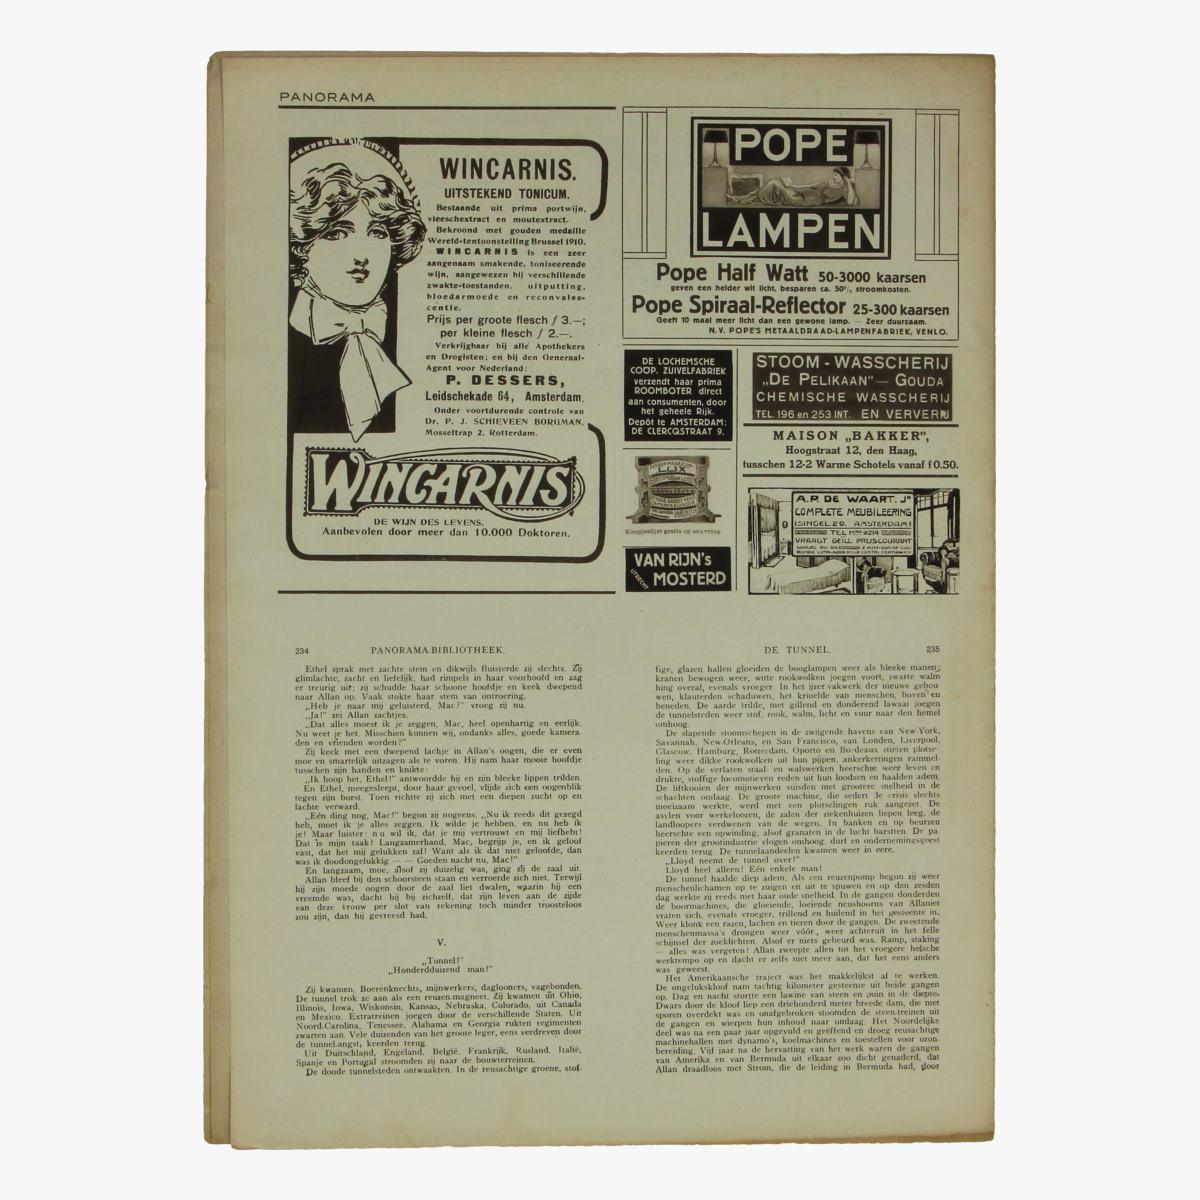 Afbeeldingen van oude weekblad panorama N°46  7 juni 1915.